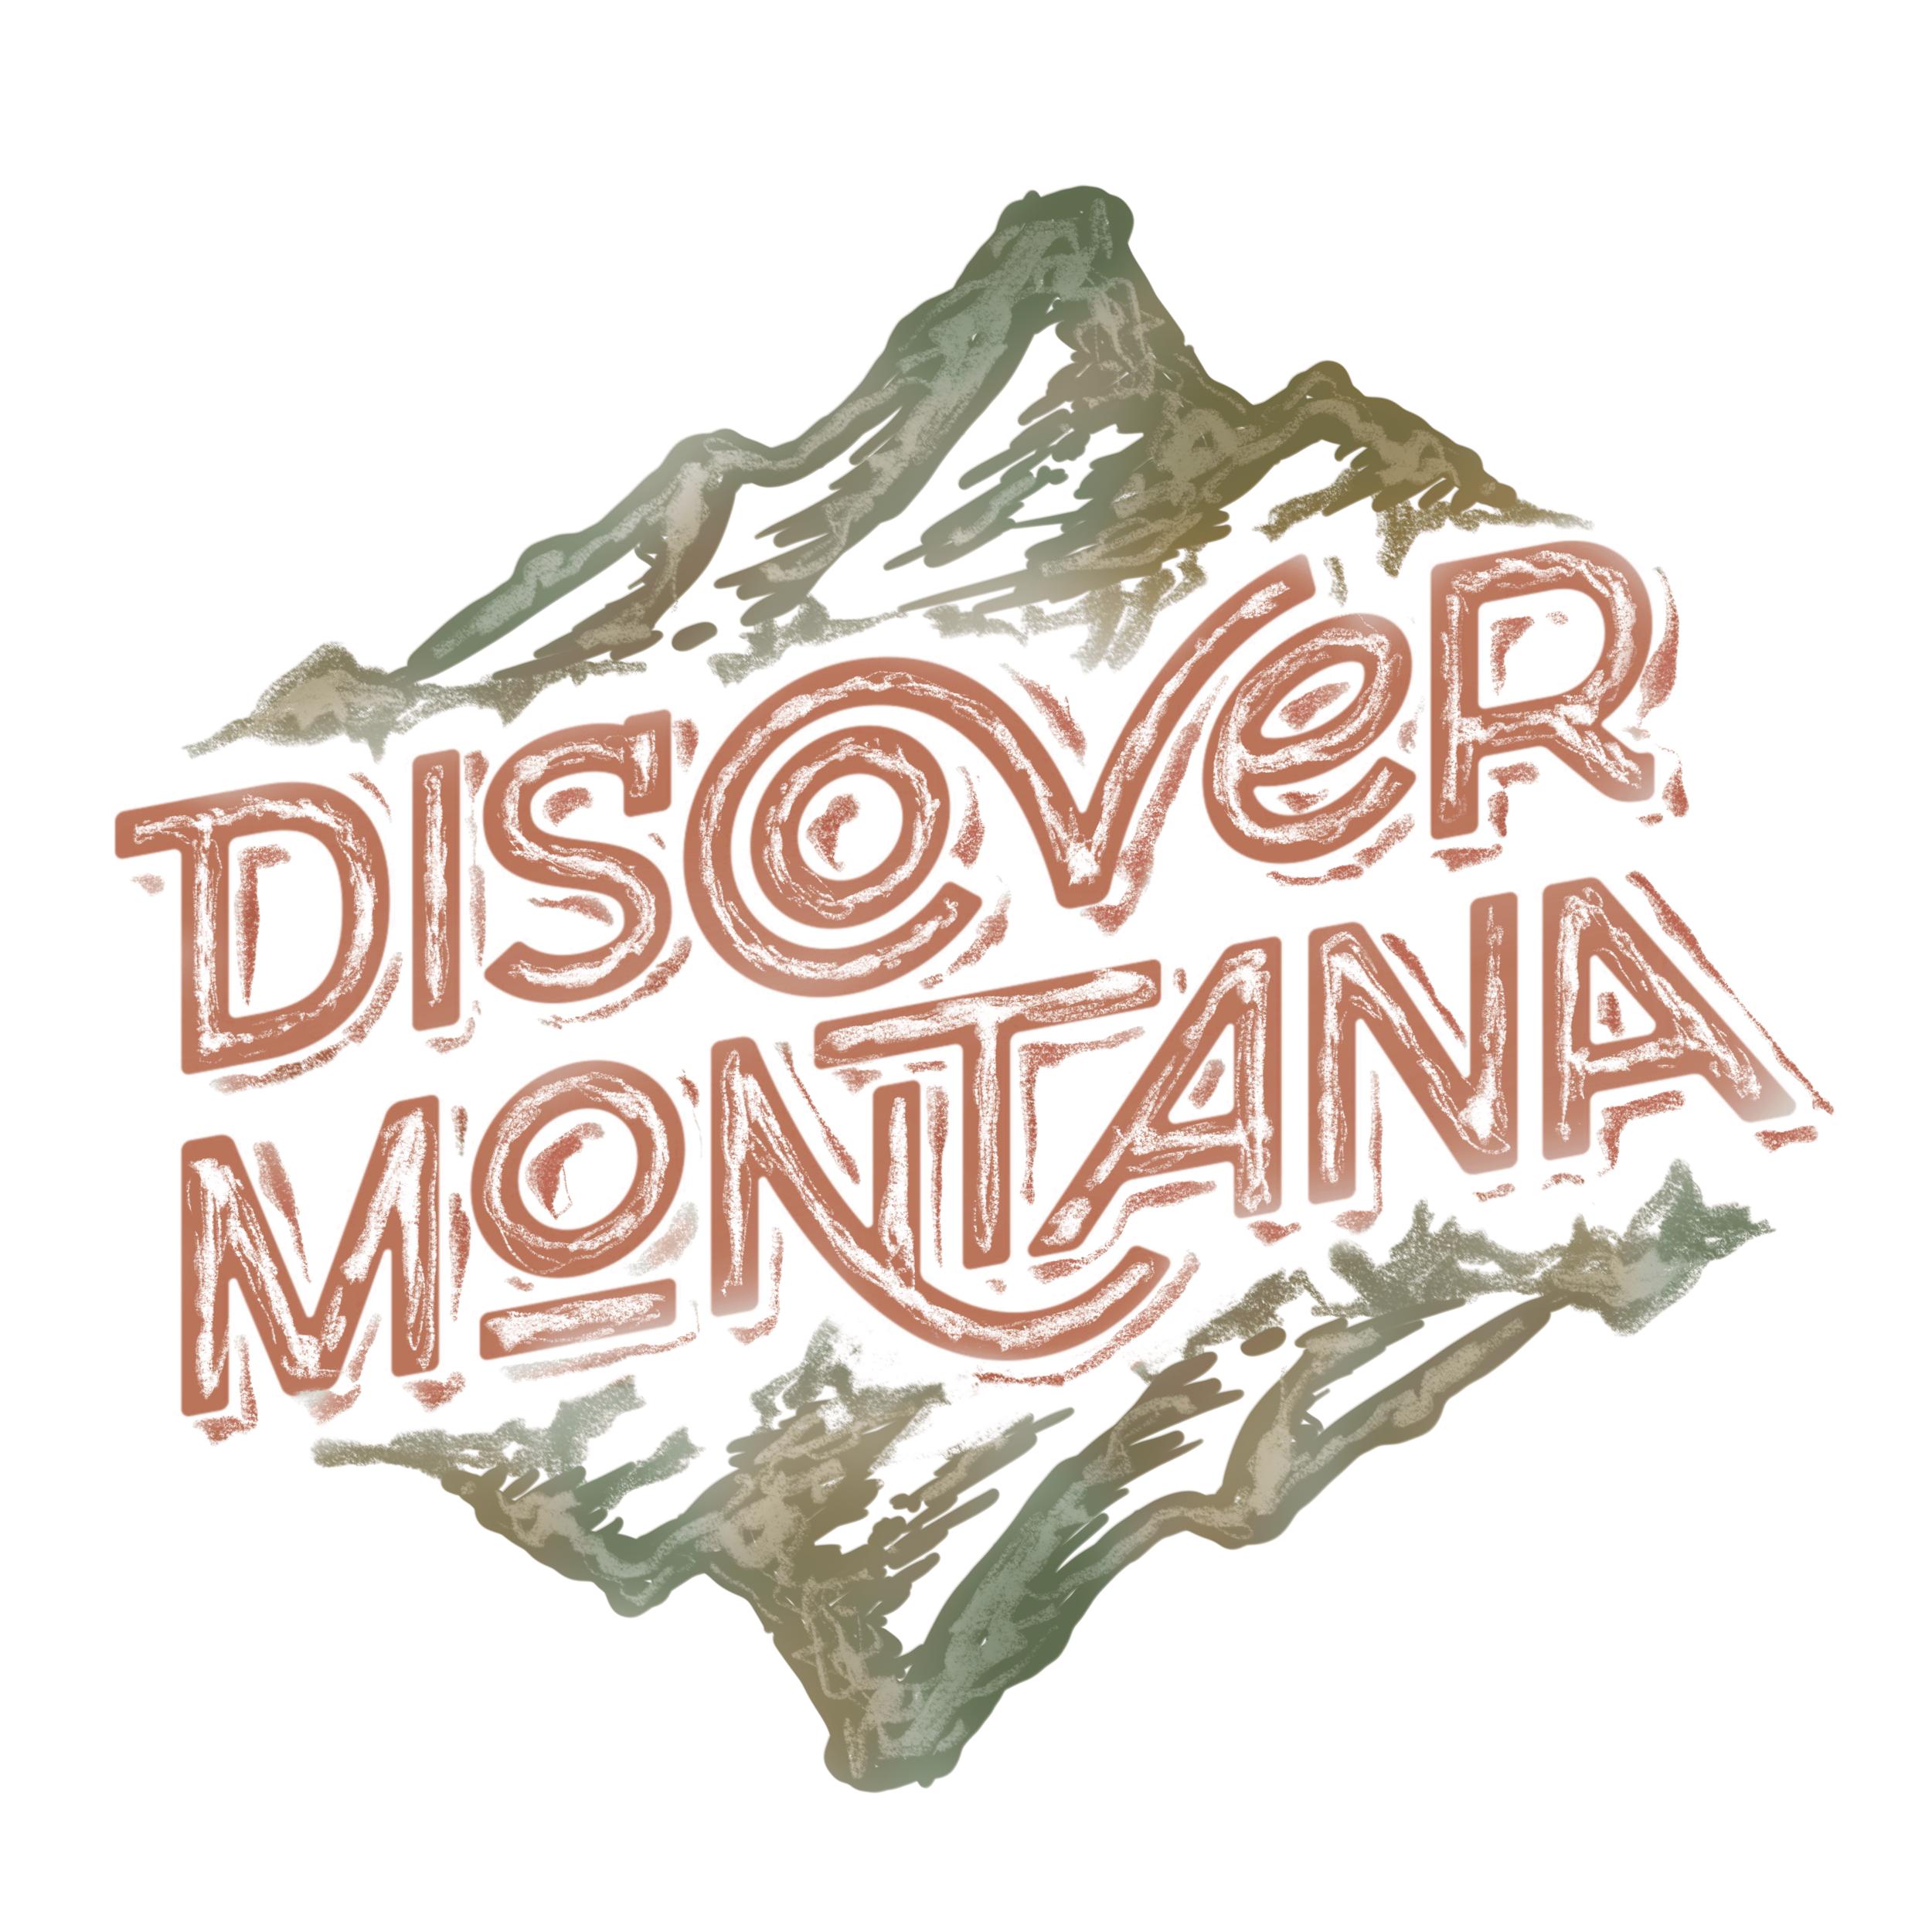 discover_montana copy.png